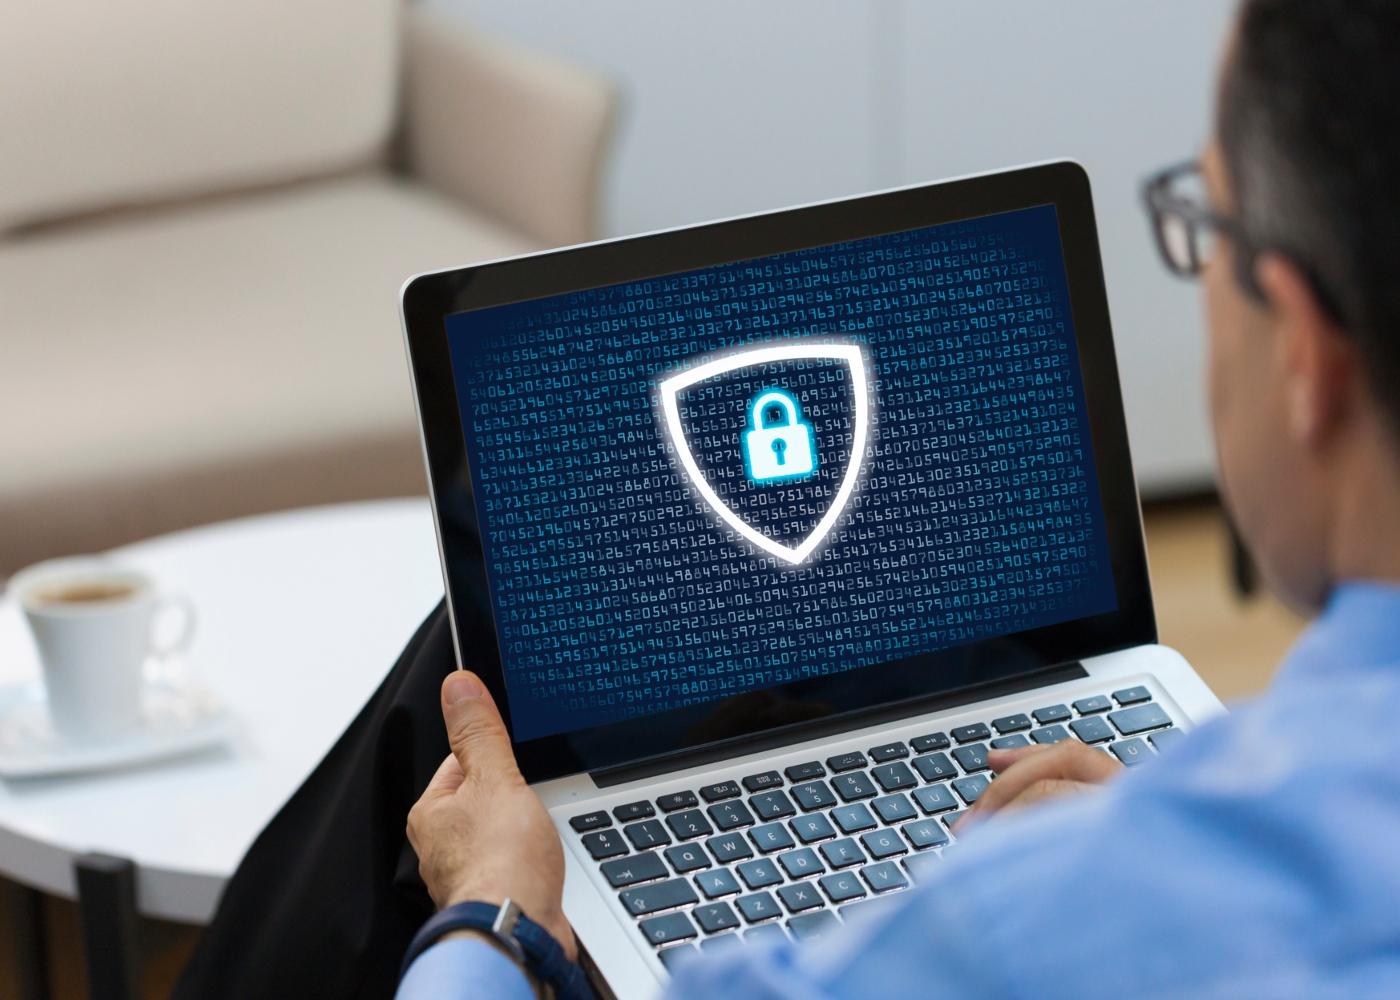 CEO a trabalhar num computador protegido contra ciber-ataques